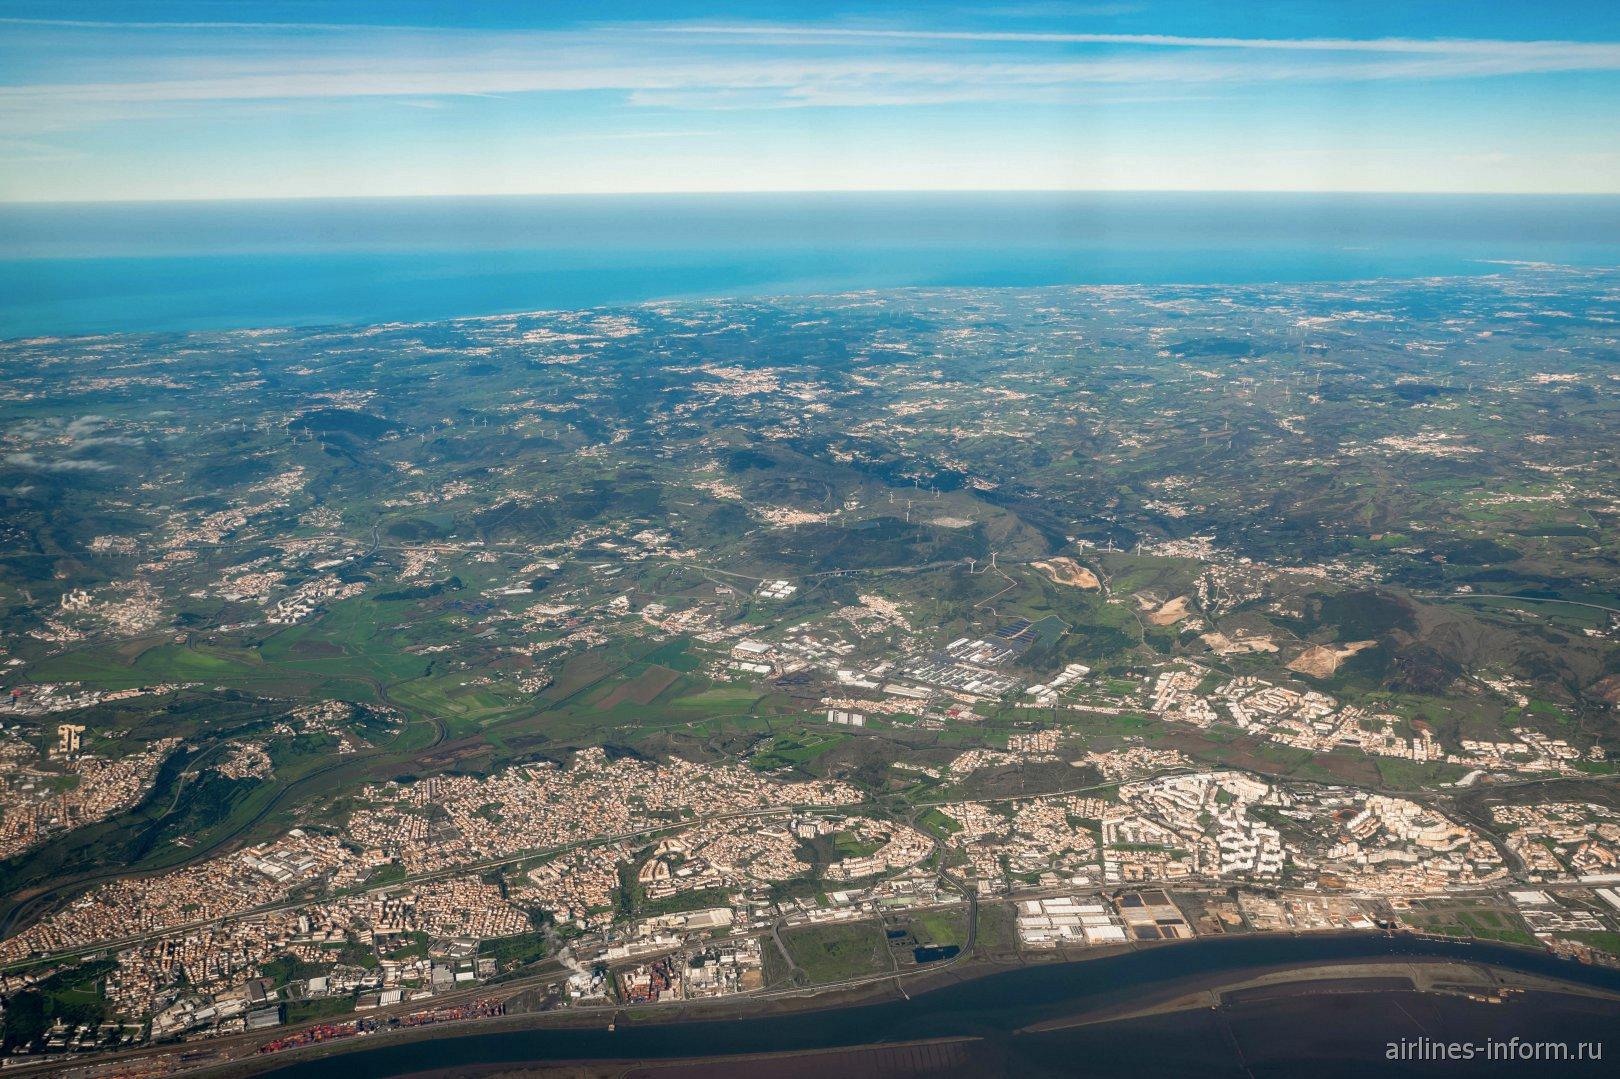 Заповедник устья реки Тежу (Тахо) и городок Алберка-ду-Рибатежу